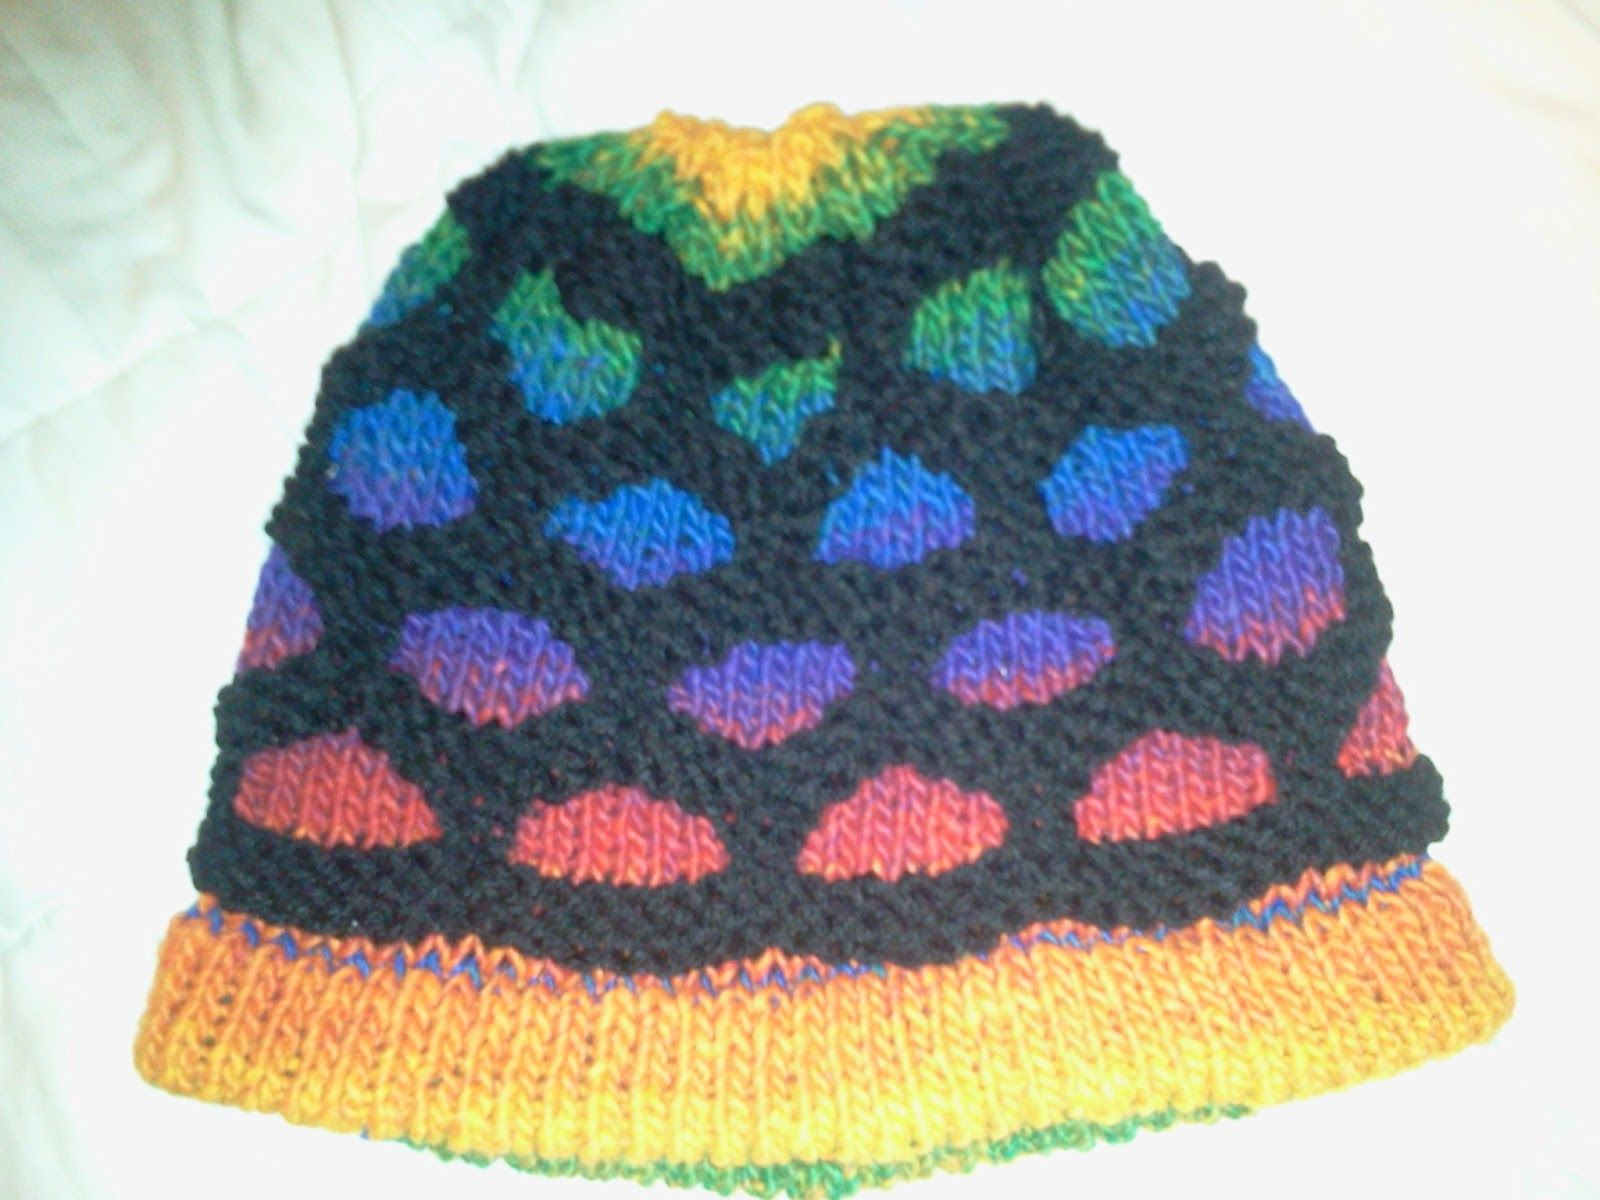 Rainbow Loom Knitting Patterns : Pinterest